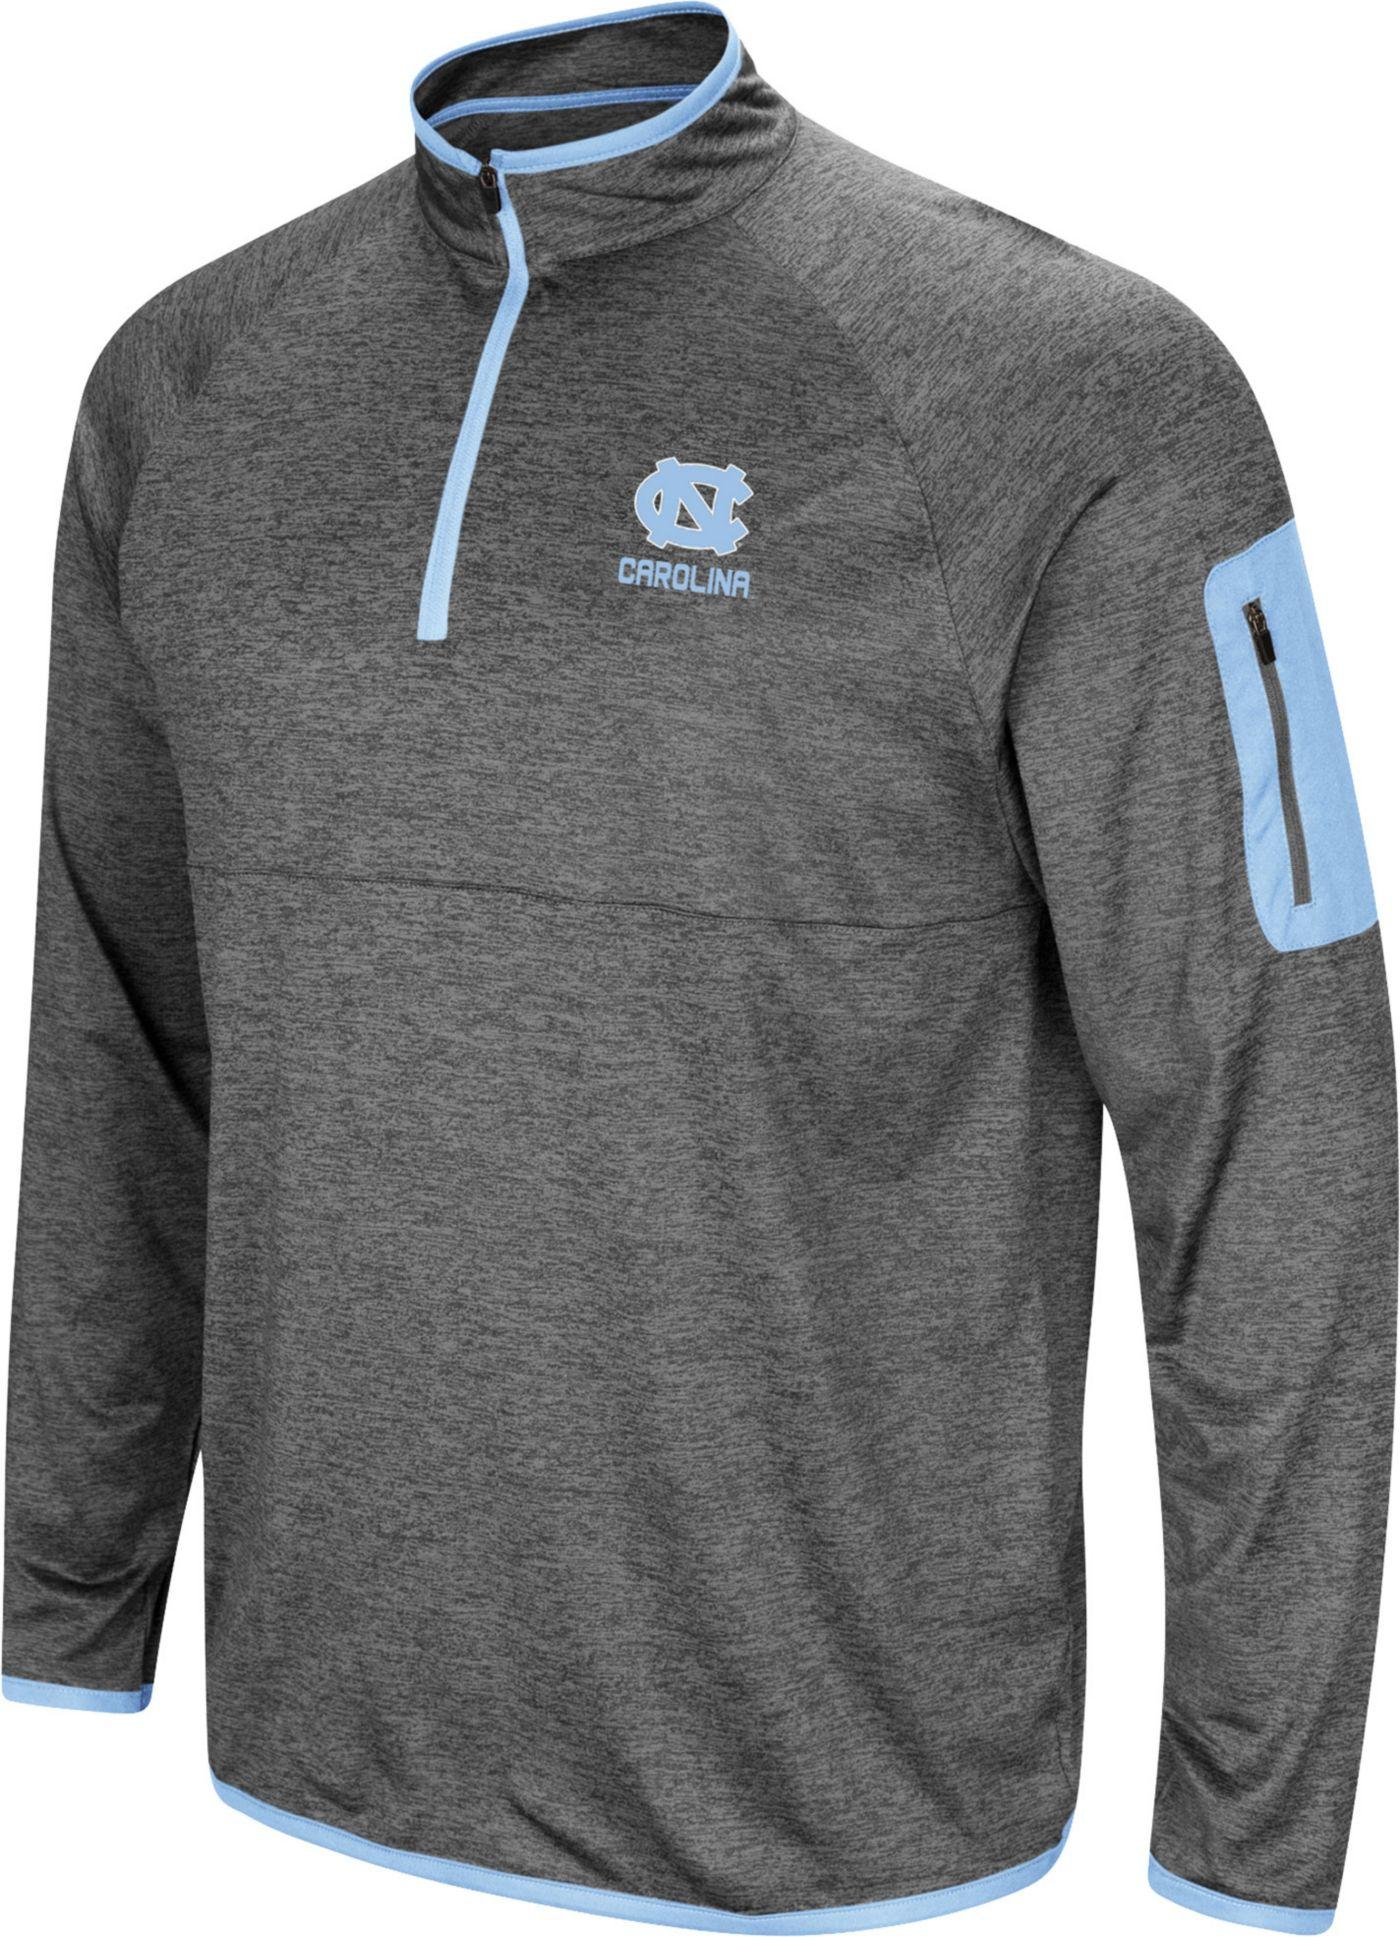 Colosseum Men's North Carolina Tar Heels Grey Indus River Quarter-Zip Shirt